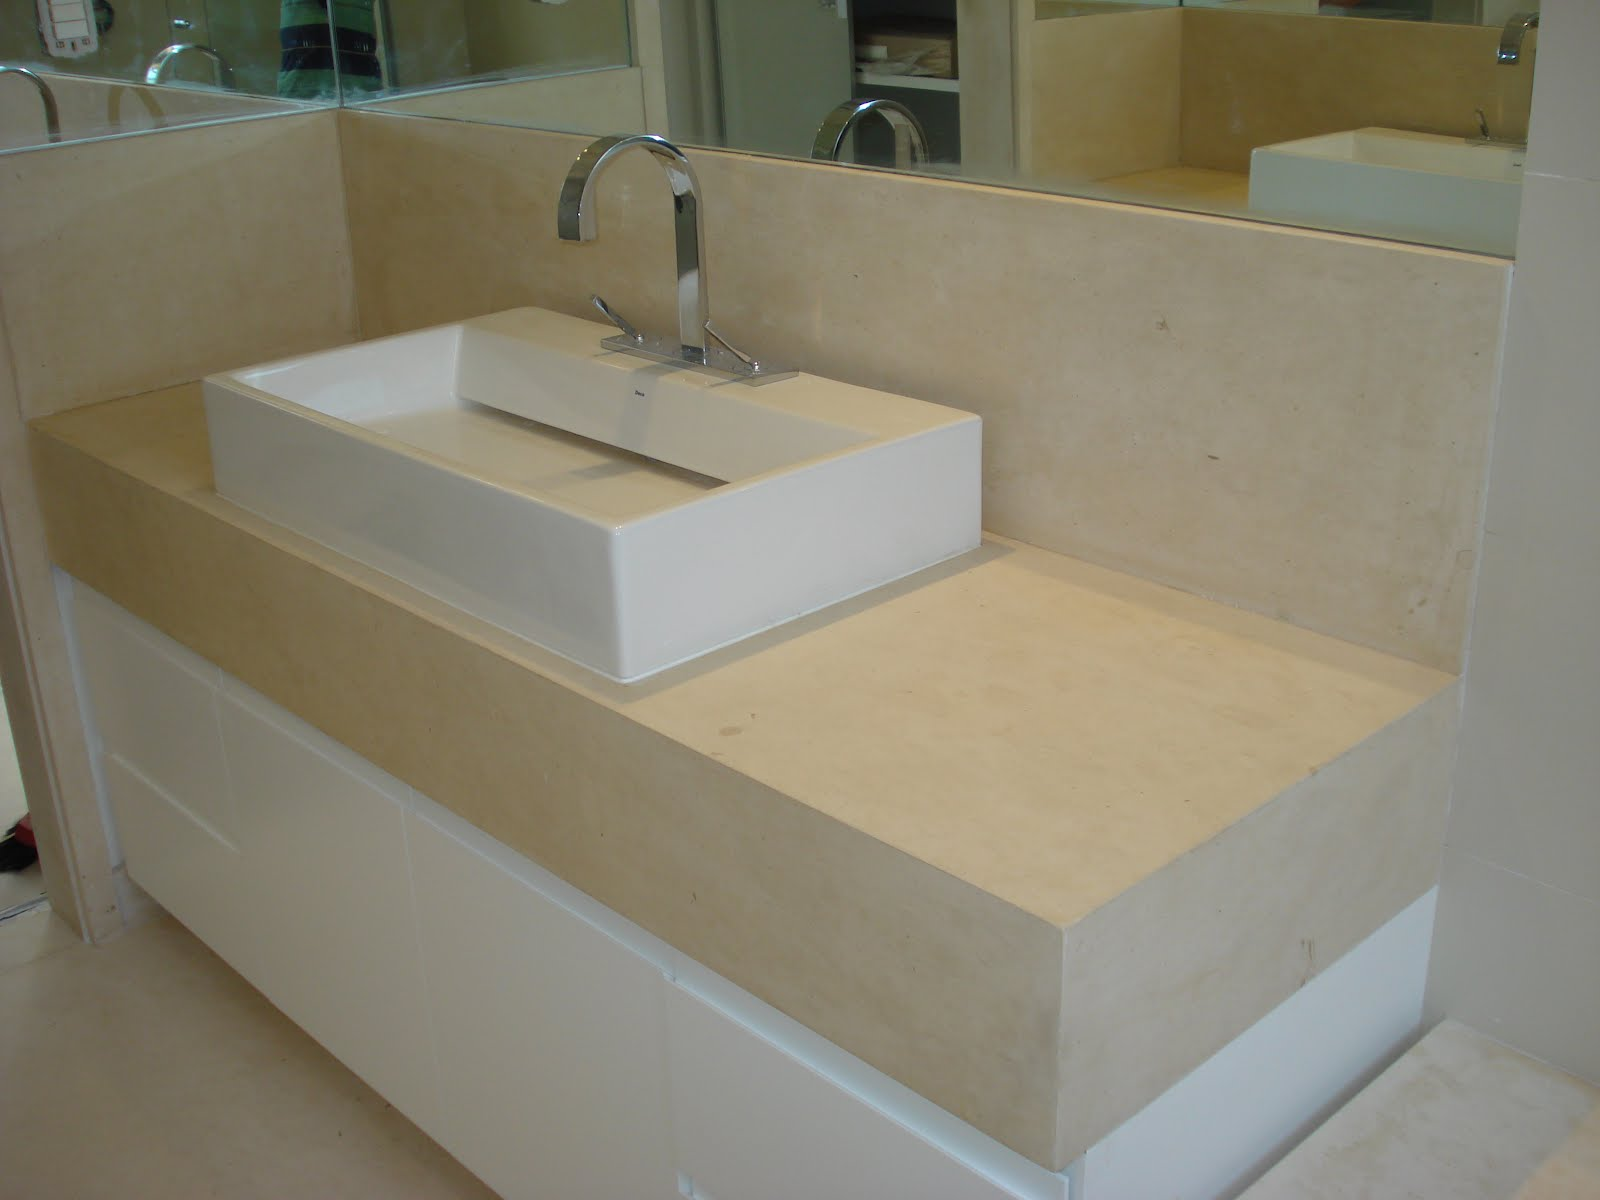 PISO LAVATORIO NIXOS DO BOX BANHEIROS MARMORE TRAVERTINO BRUTO  #5F5130 1600x1200 Bancada Banheiro Marmore Travertino